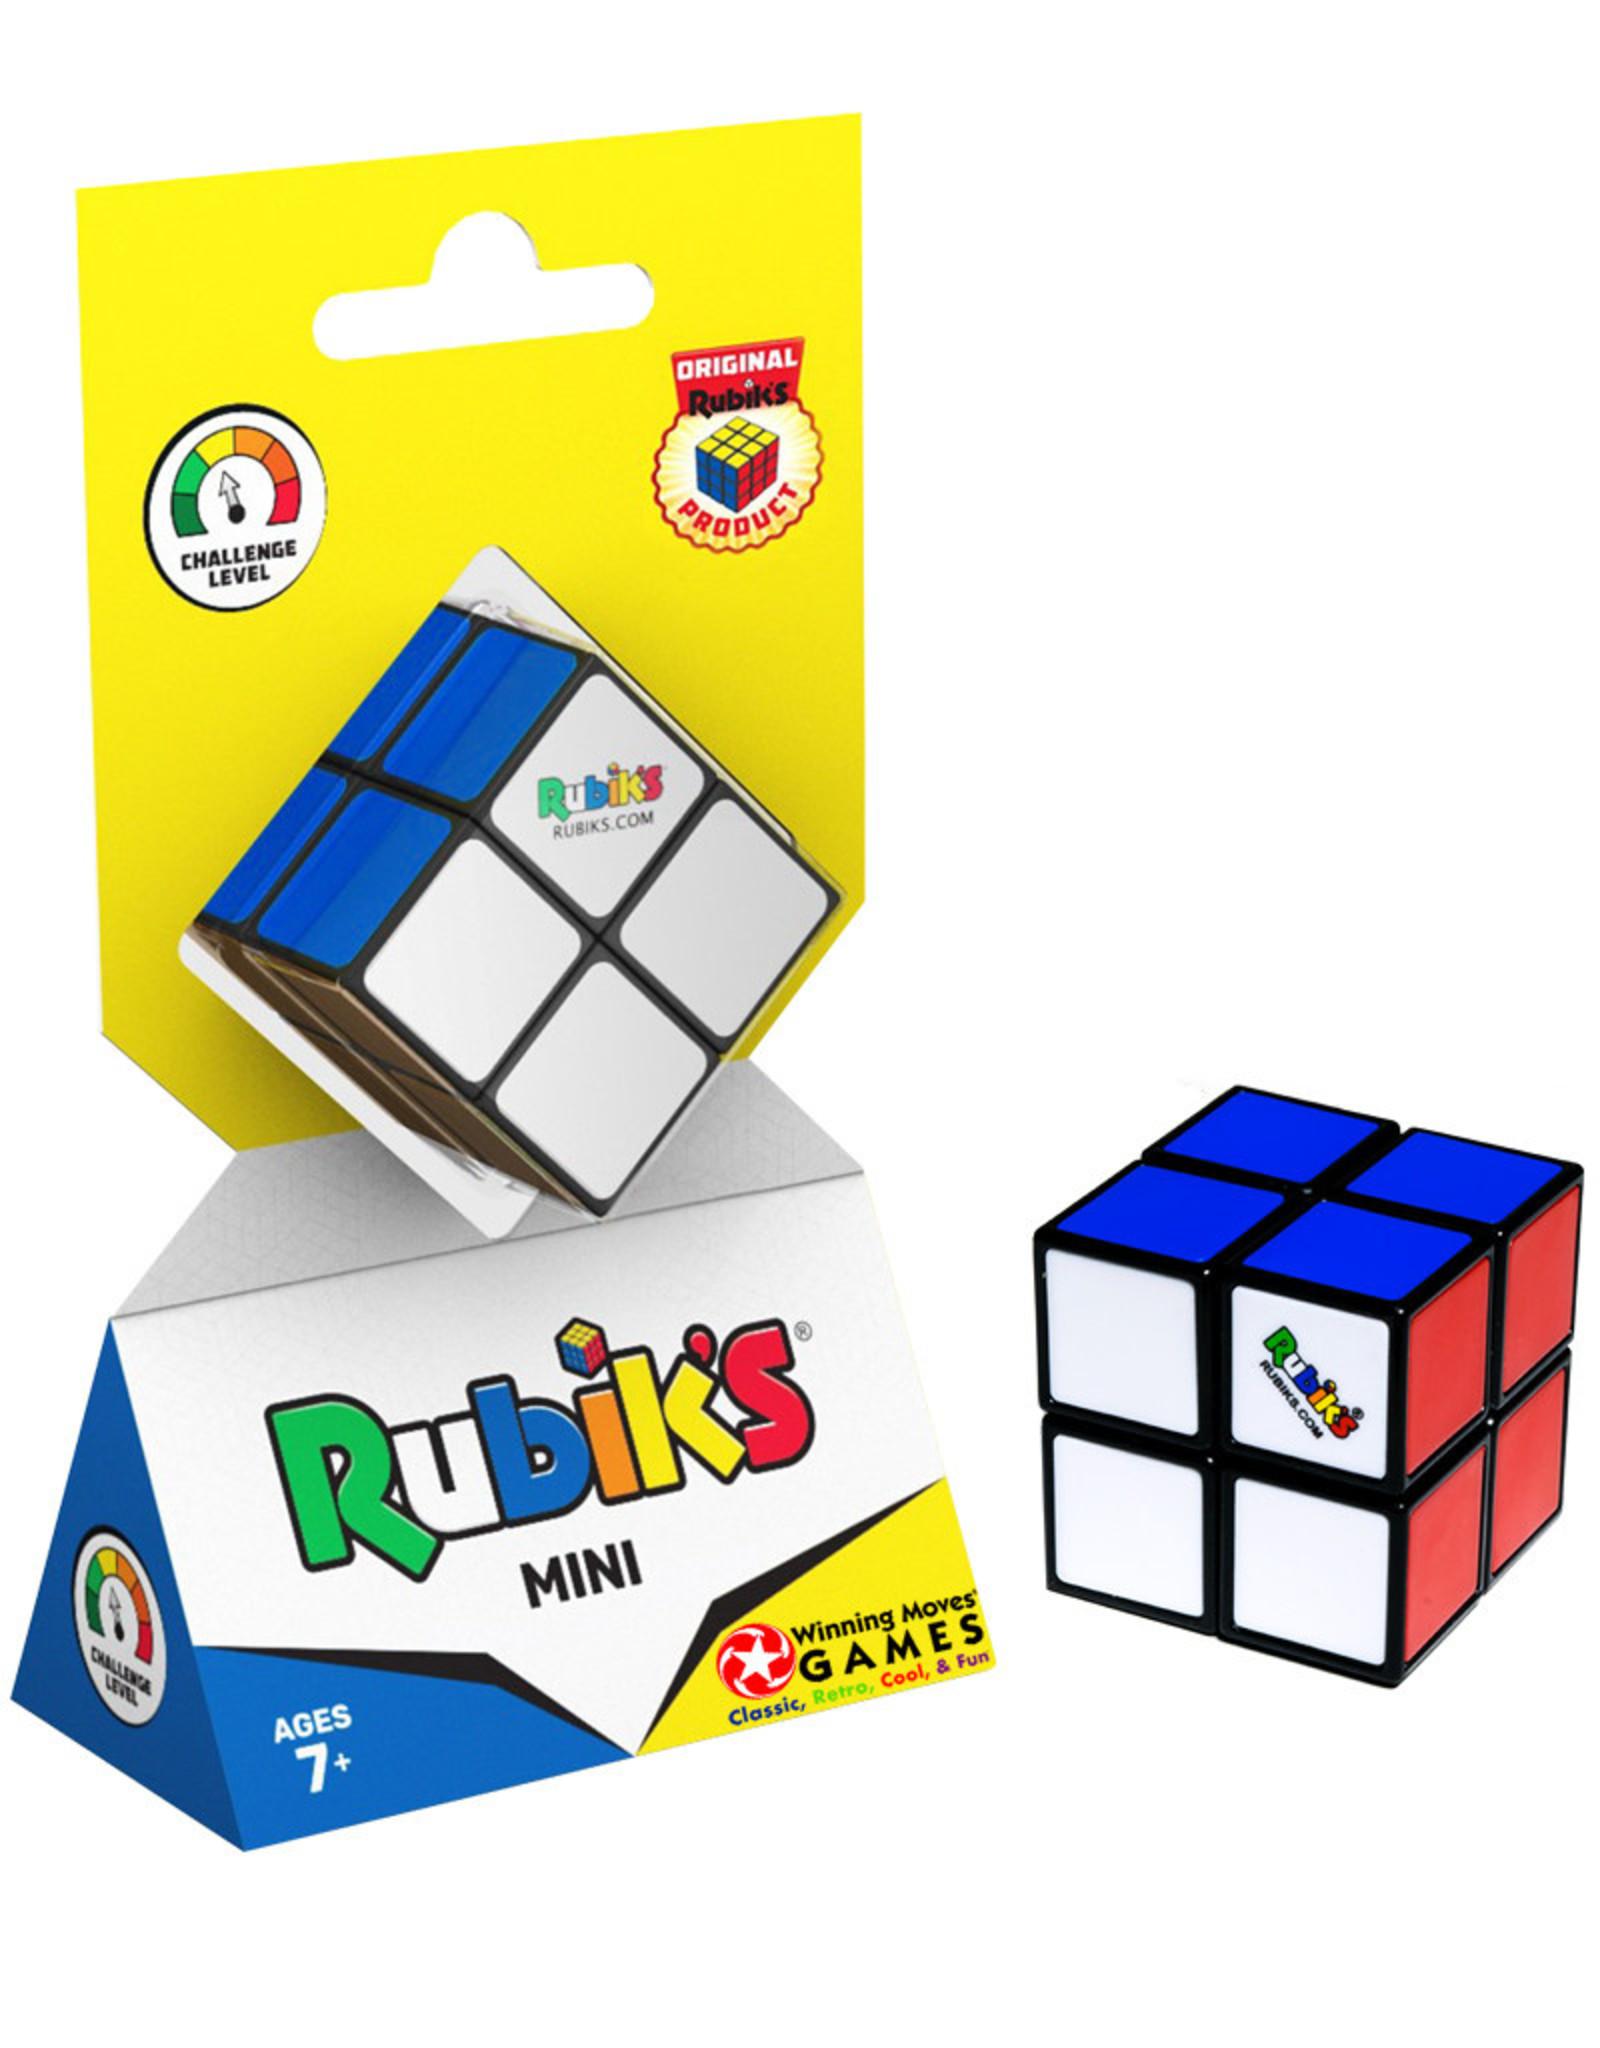 Rubik's Rubik's 2x2 Cube